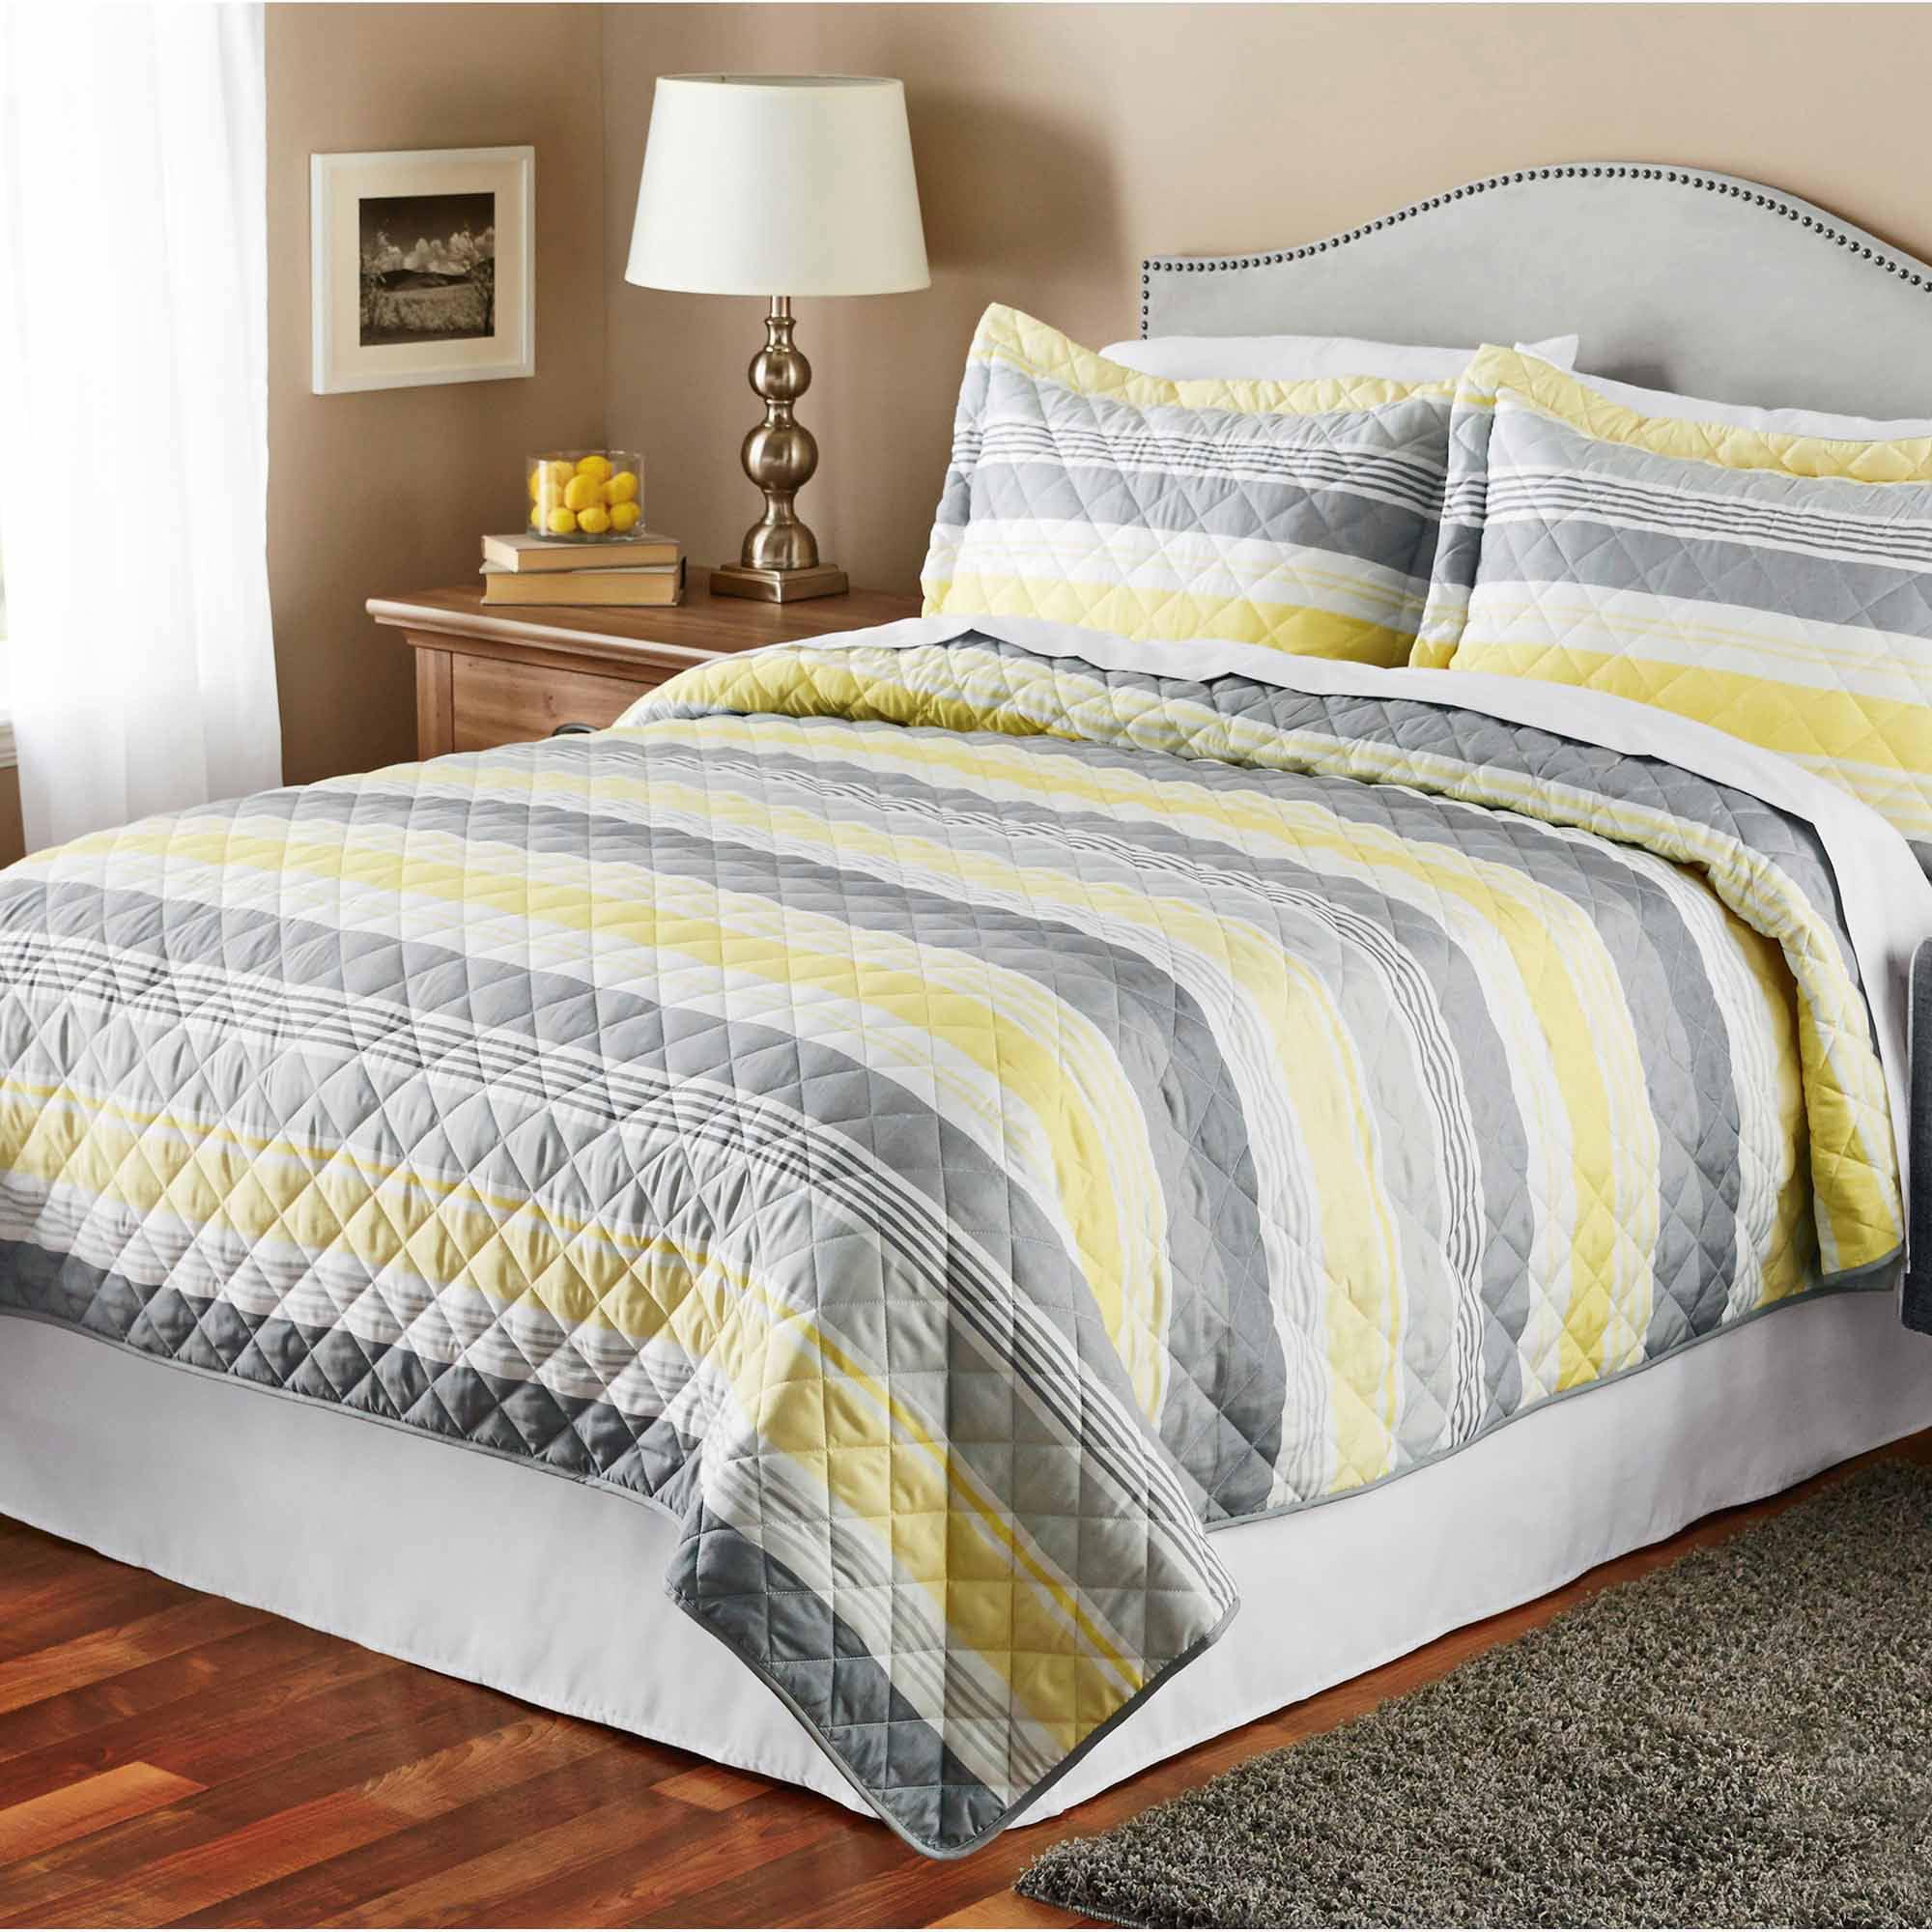 Mainstays Grey Stripe Quilt - Walmart.com : yellow and gray quilt - Adamdwight.com